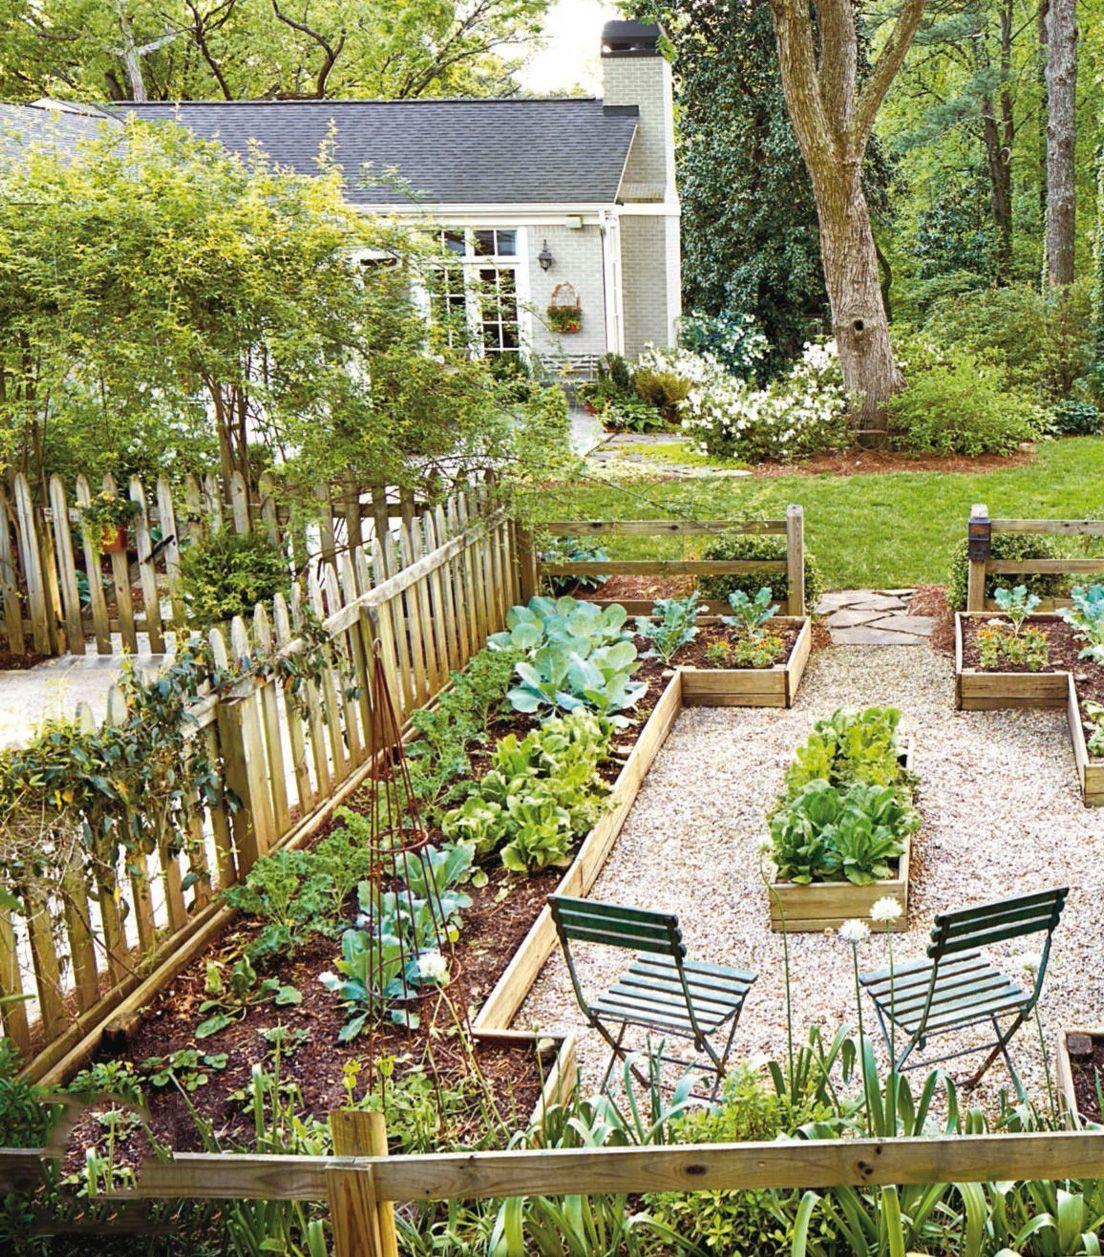 Patio Garden Ideas Lighting And Backyard Garden On A Budget Flower Beds In 2020 Backyard Garden Design Small Backyard Landscaping Vegetable Garden Design